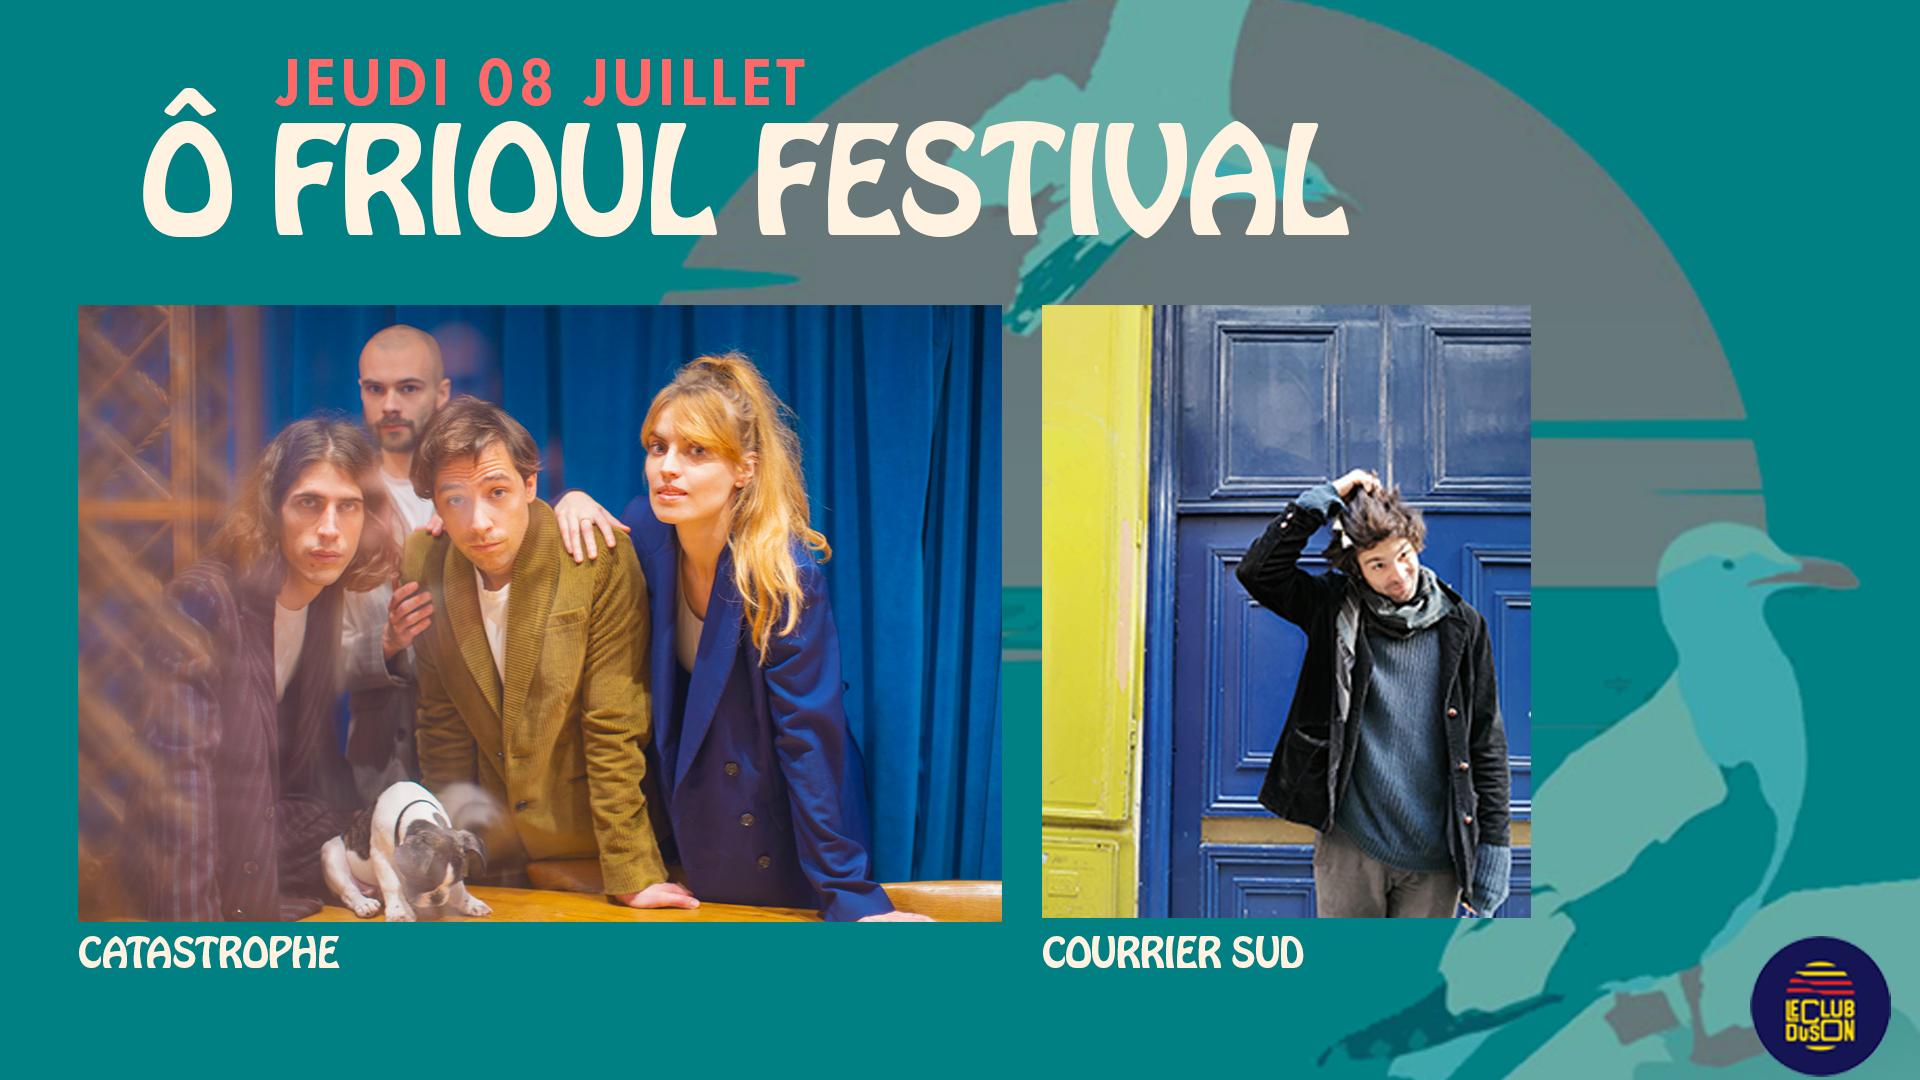 Ô Frioul Festival | Jeudi